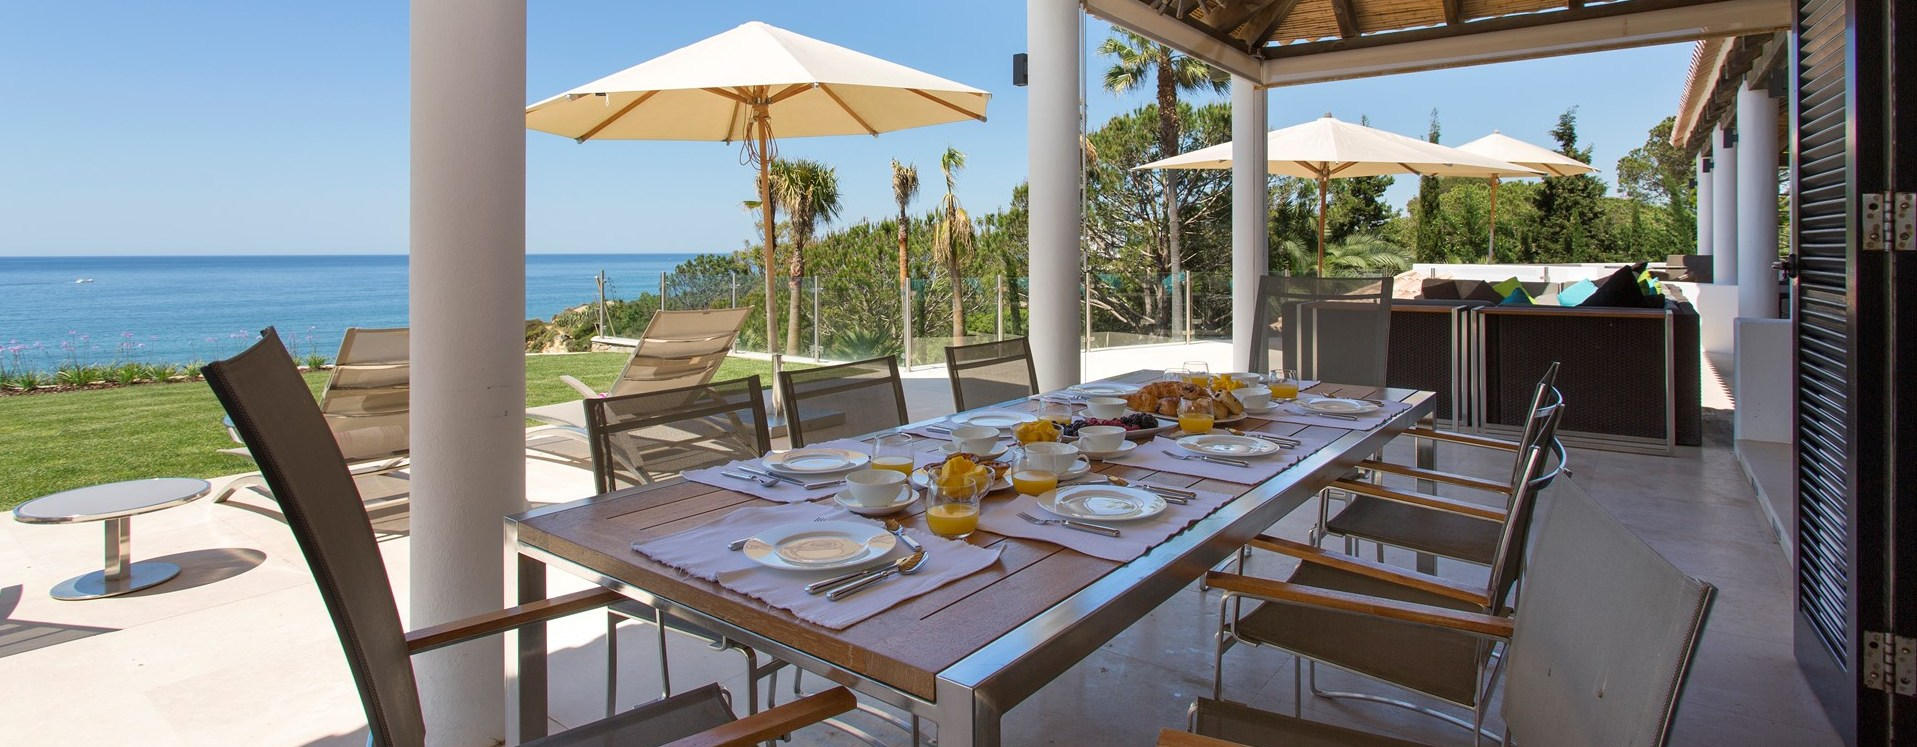 villa-balbina-al-fresco-dining